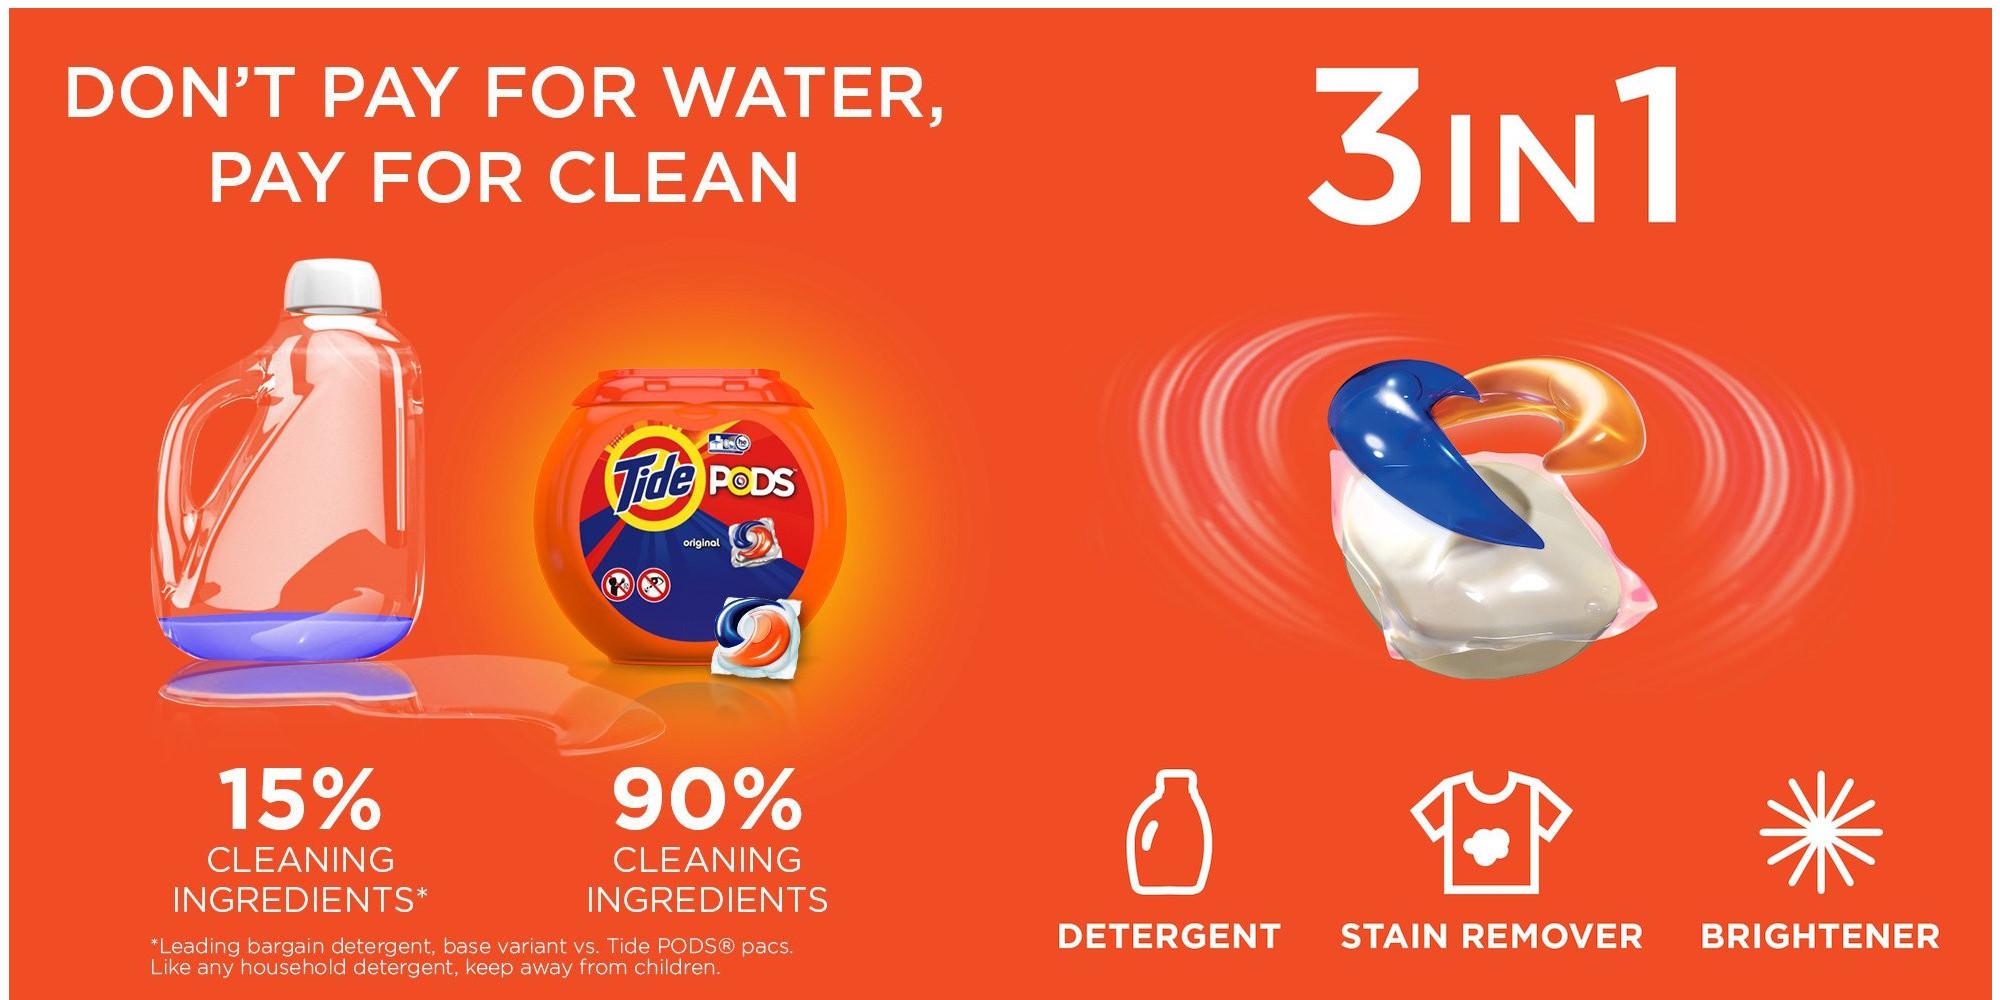 tide-pods-original-scent-he-turbo-laundry-detergent-3